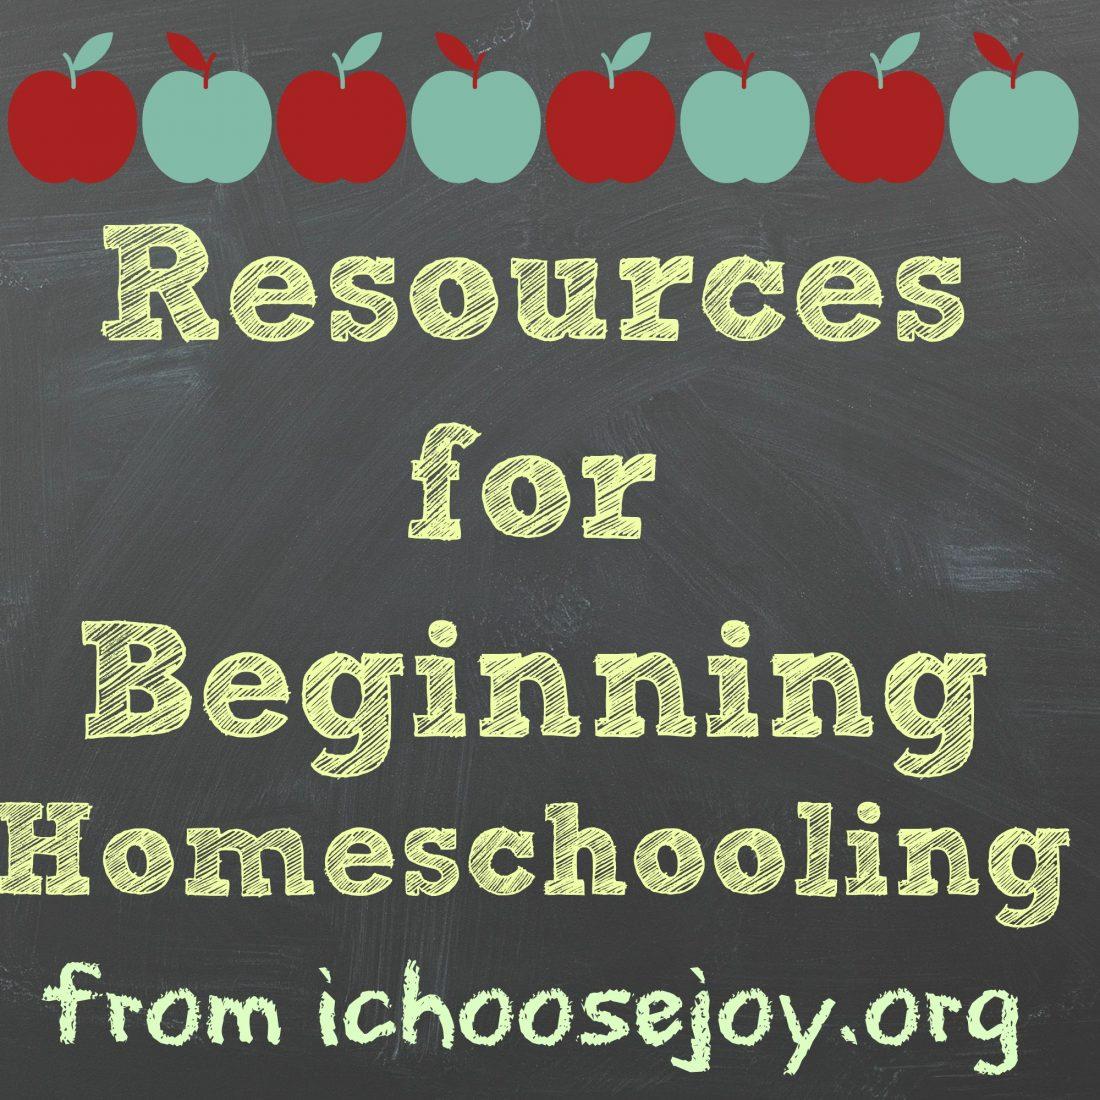 Resources for Beginning Homeschooling